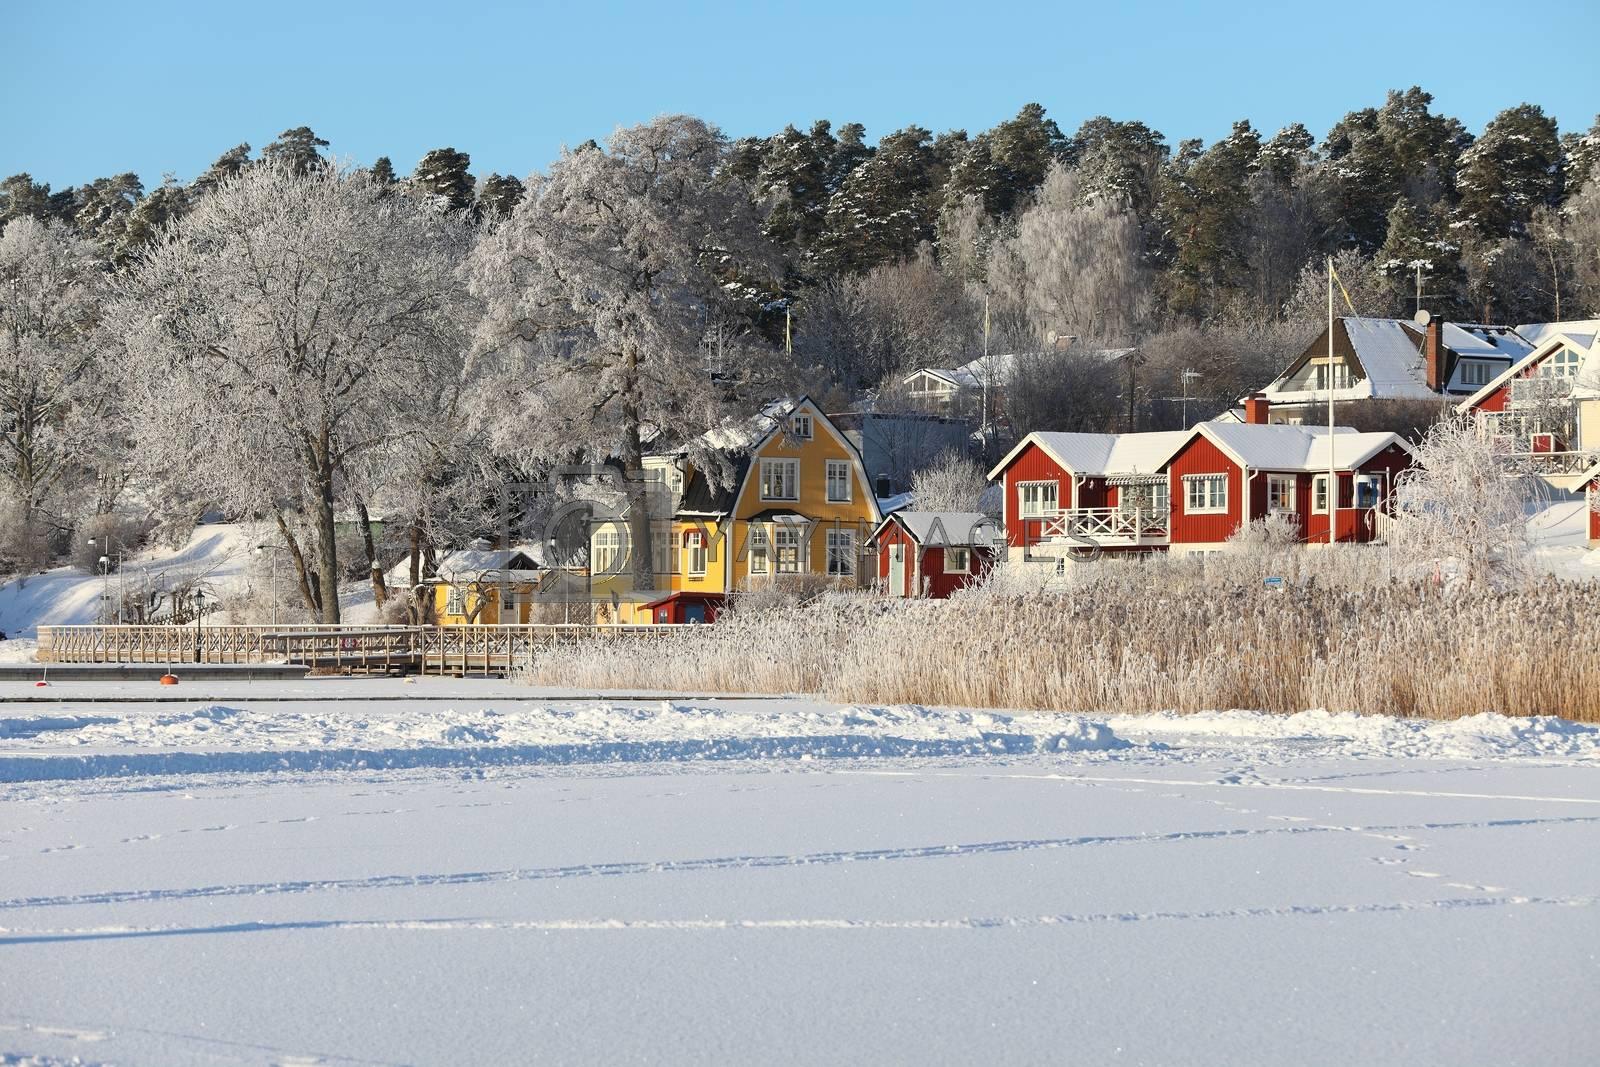 Winter landscape with frozen lake